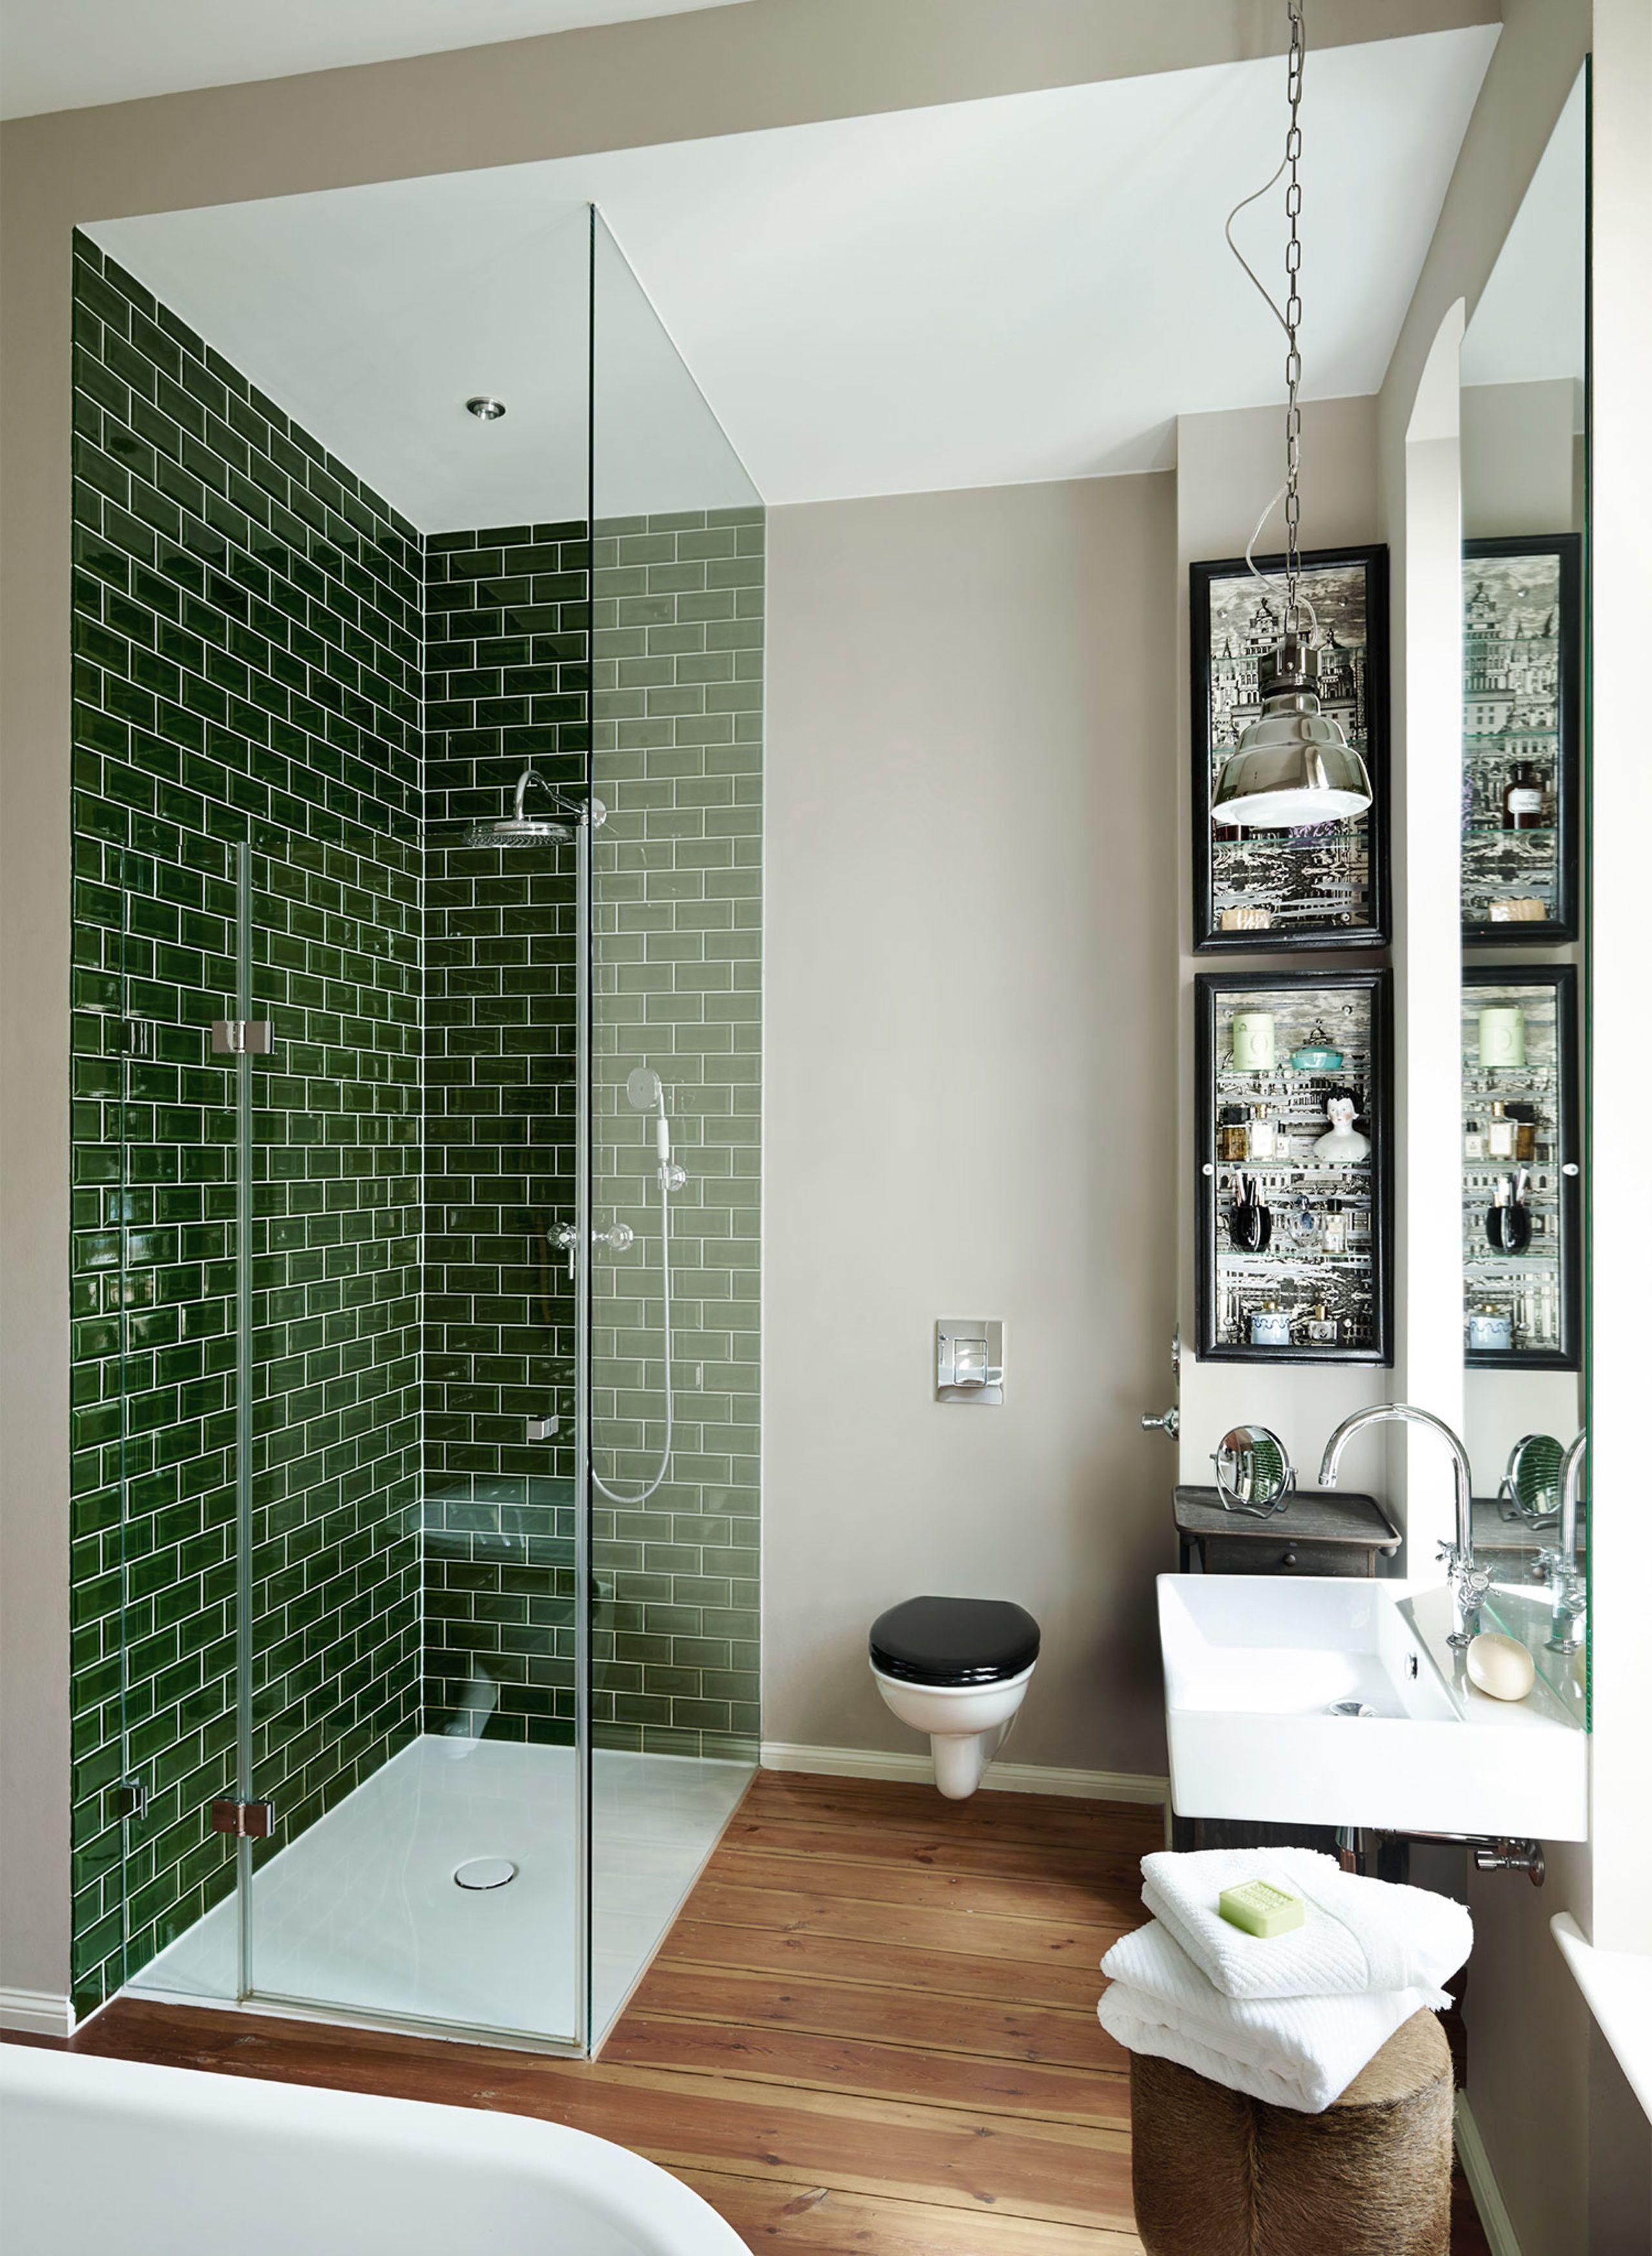 Ideen Fur Badezimmer Begehbare Ebenerdige Dusche Mit Glasturen Dunkelgrune Fliesen Mehr Interior Design Von First Badezimmer Ebenerdige Dusche Berlin Design